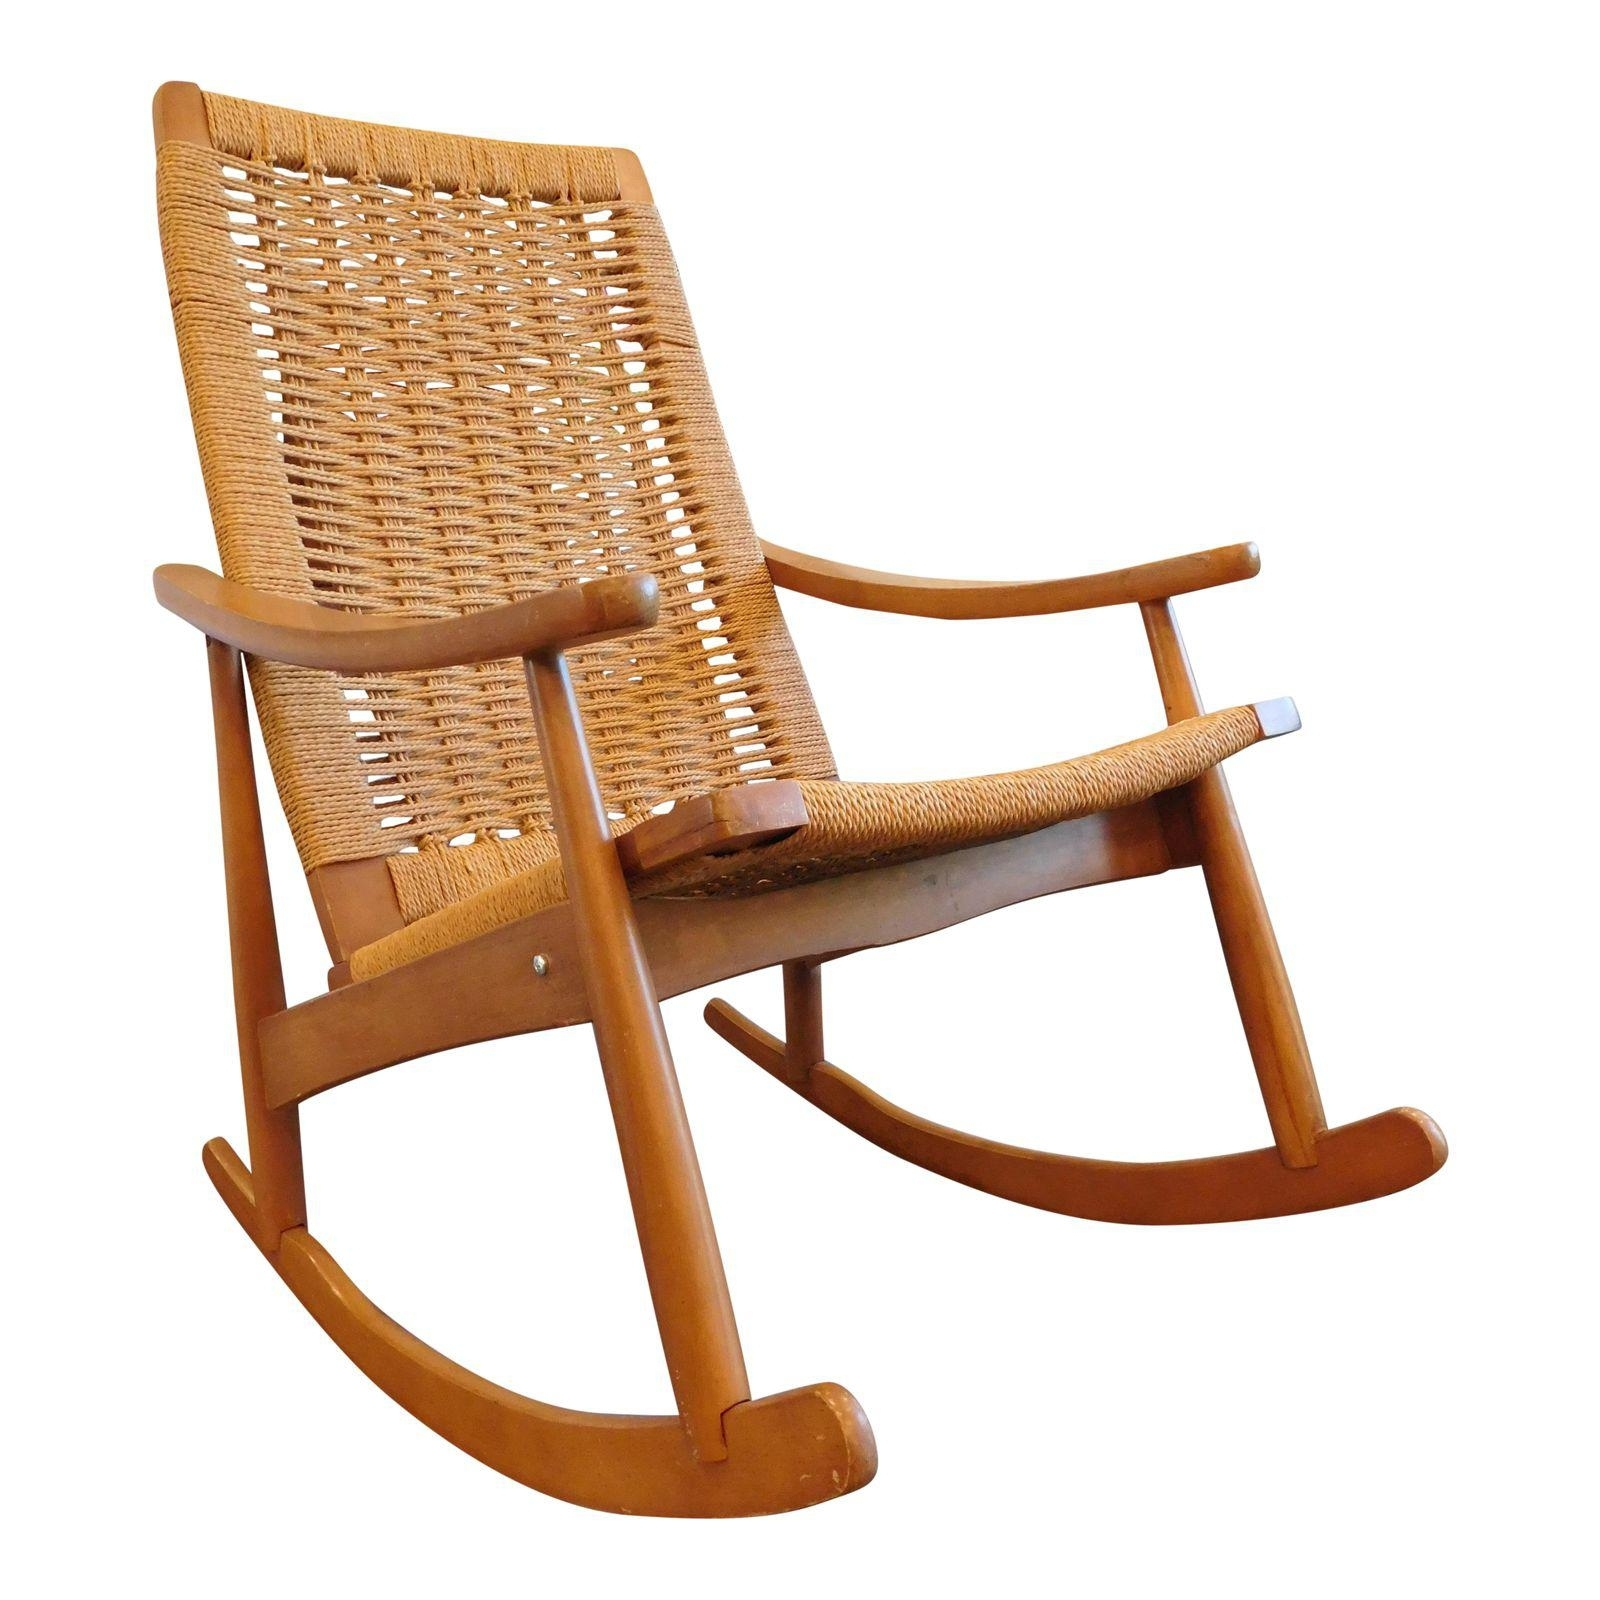 Current Vintage Wicker Rocking Chairs Regarding Vintage Yugoslavian Hans Wegner Style Wicker Rocking Chair Antique (View 14 of 20)